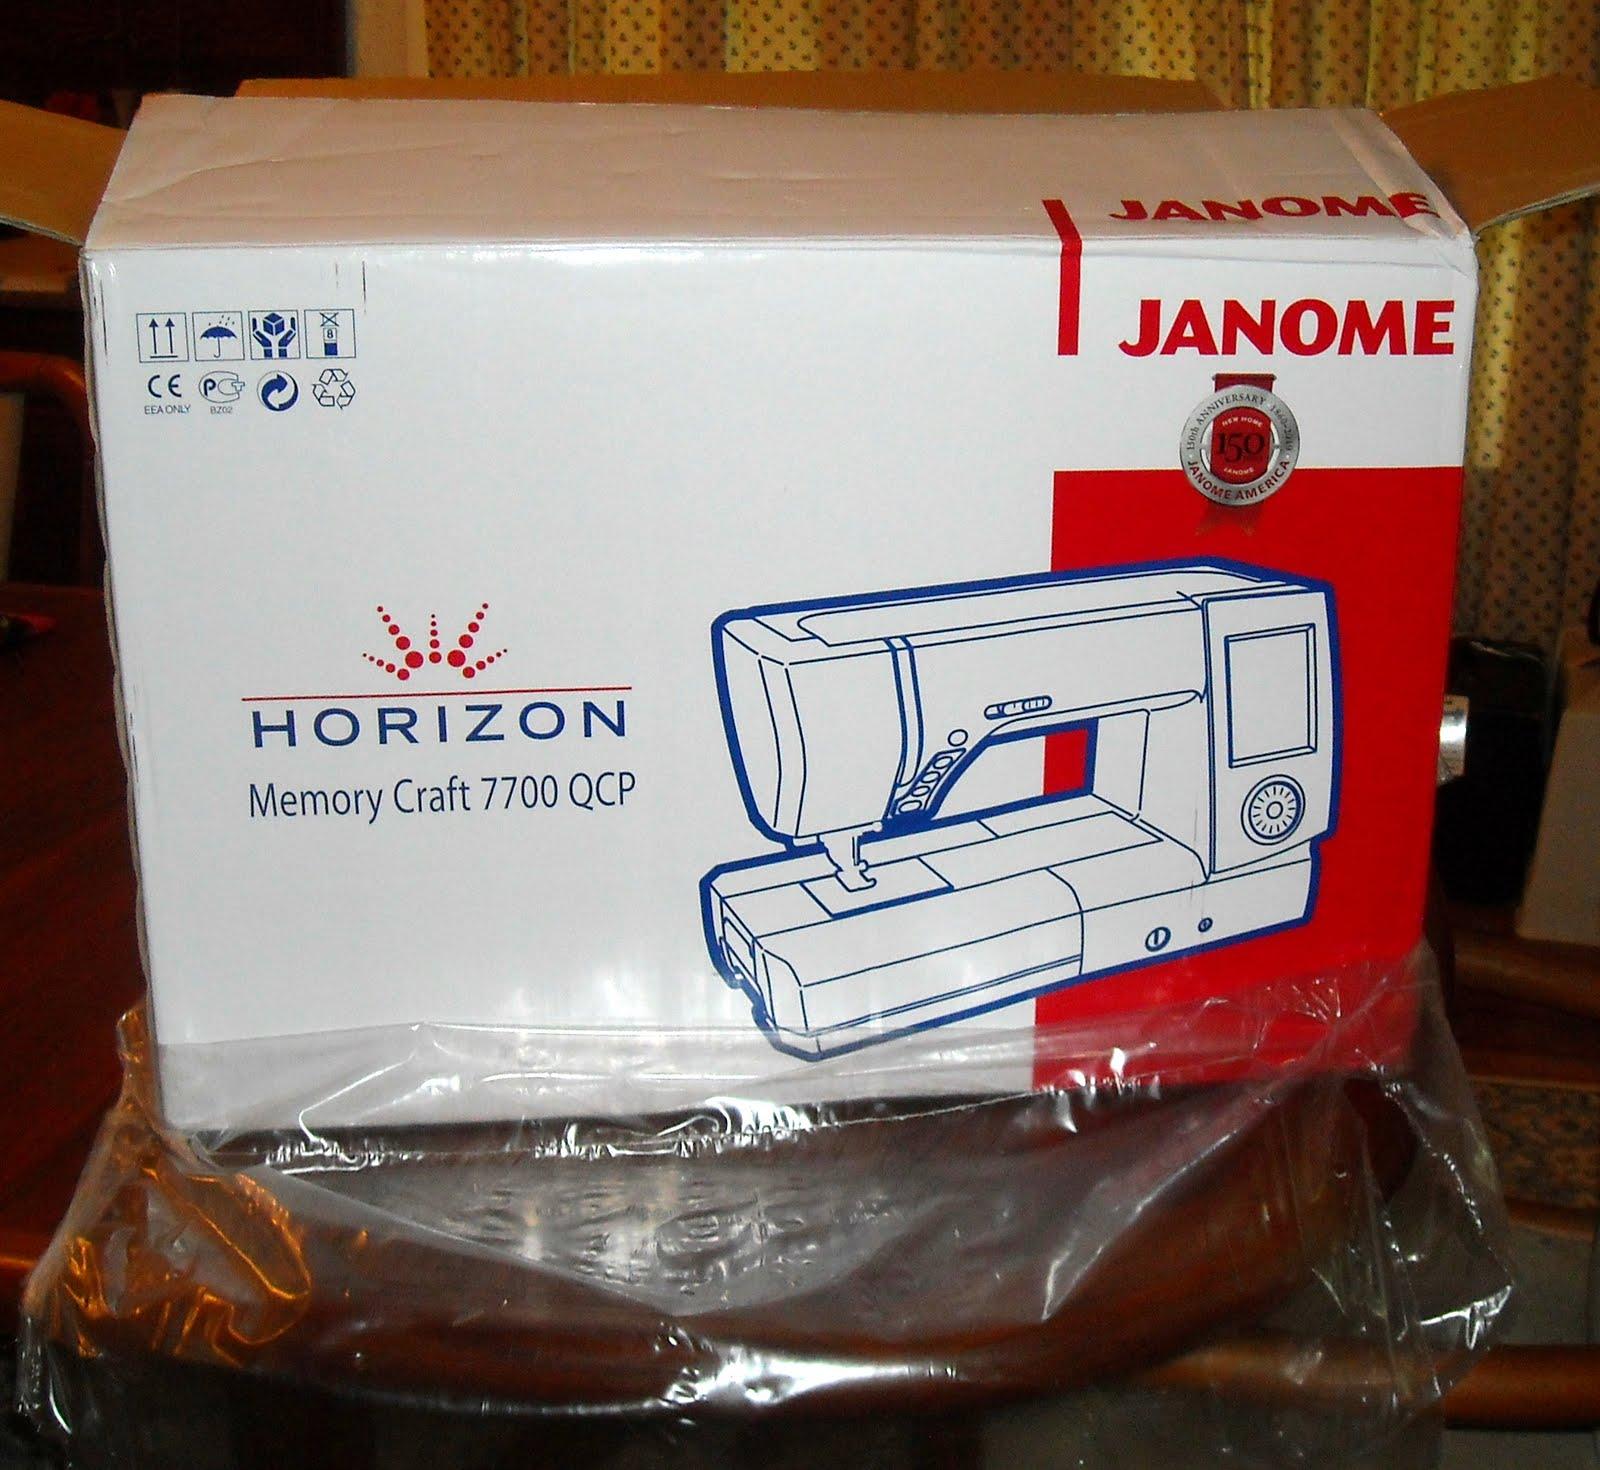 Janome Heritage: Memory Craft 4800 - Janome America: World ...